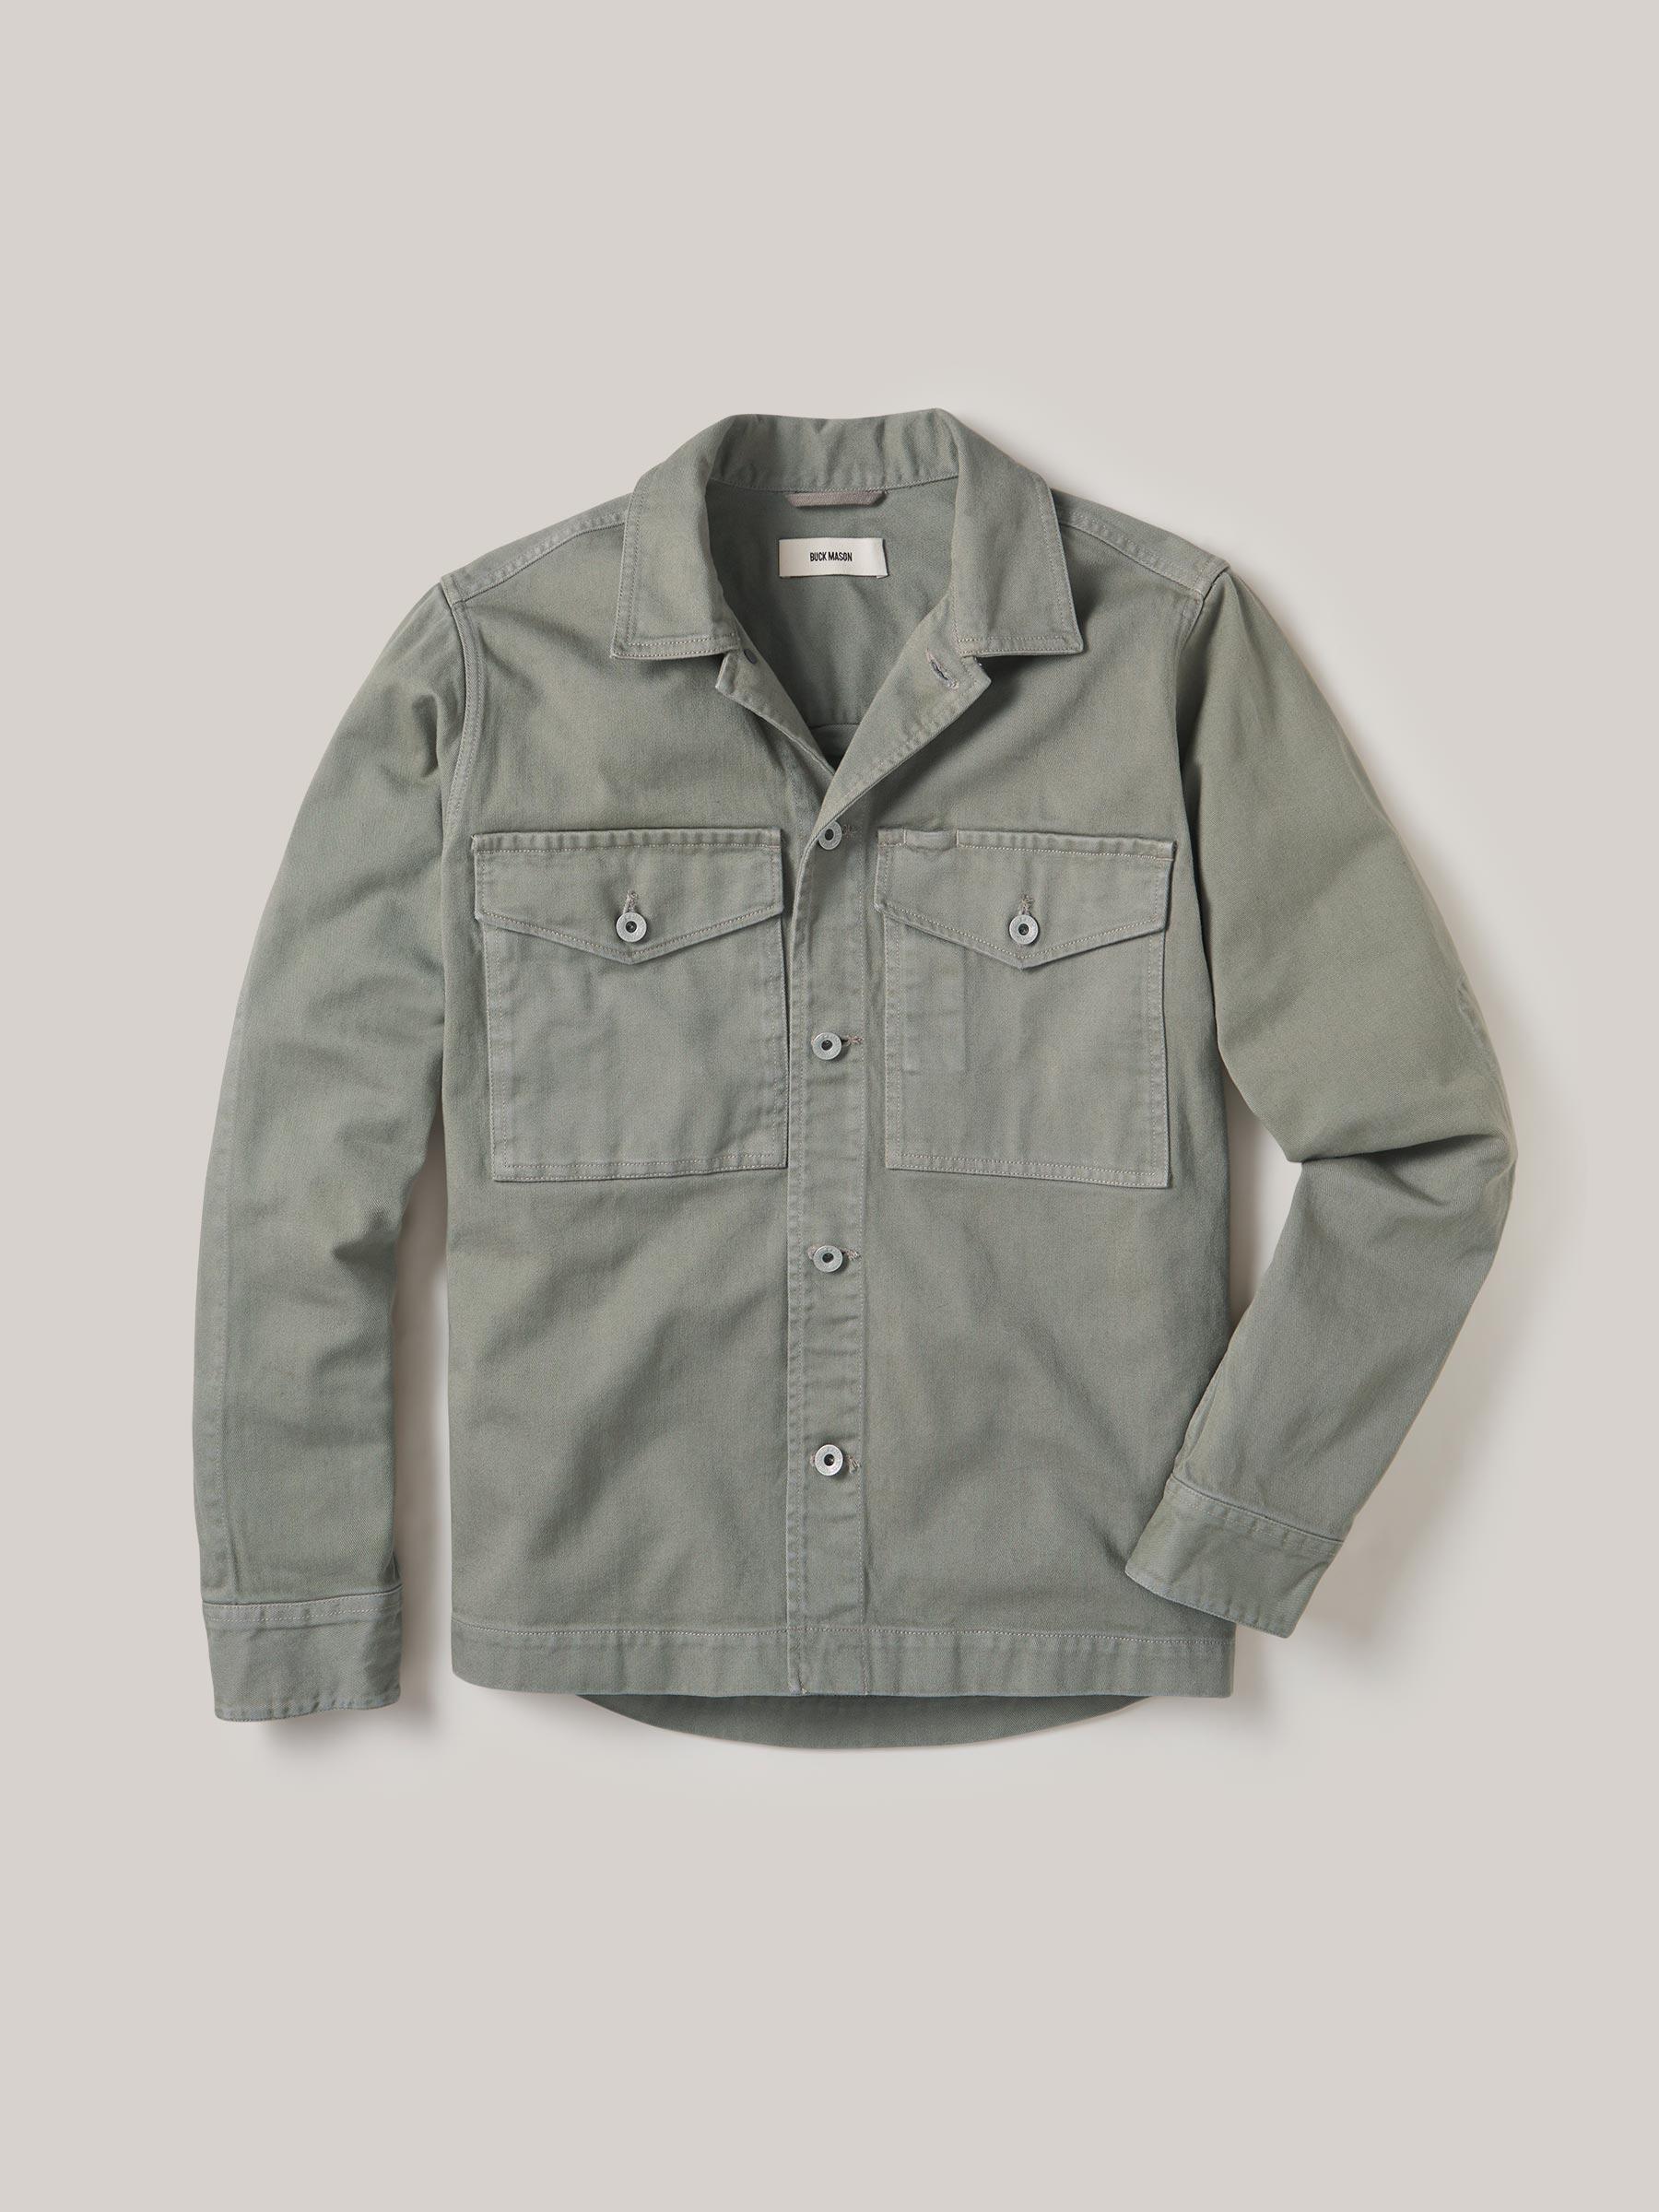 green army jacket men's